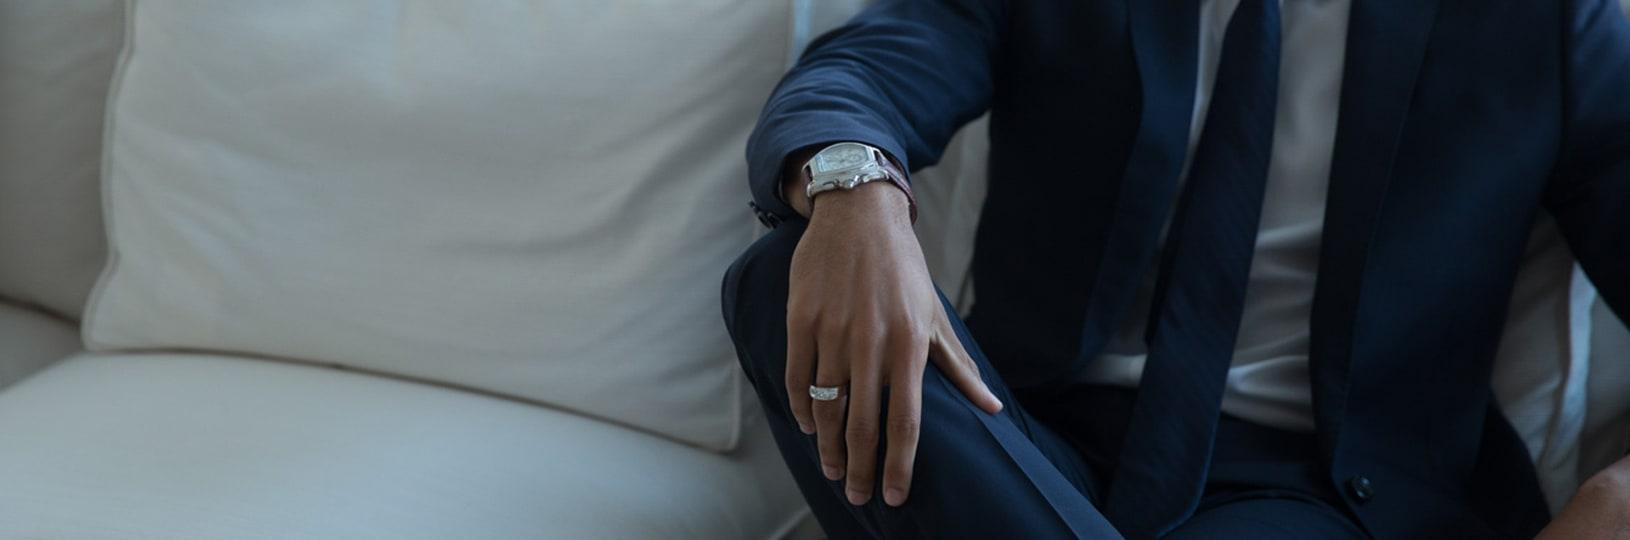 Men's right hand ring